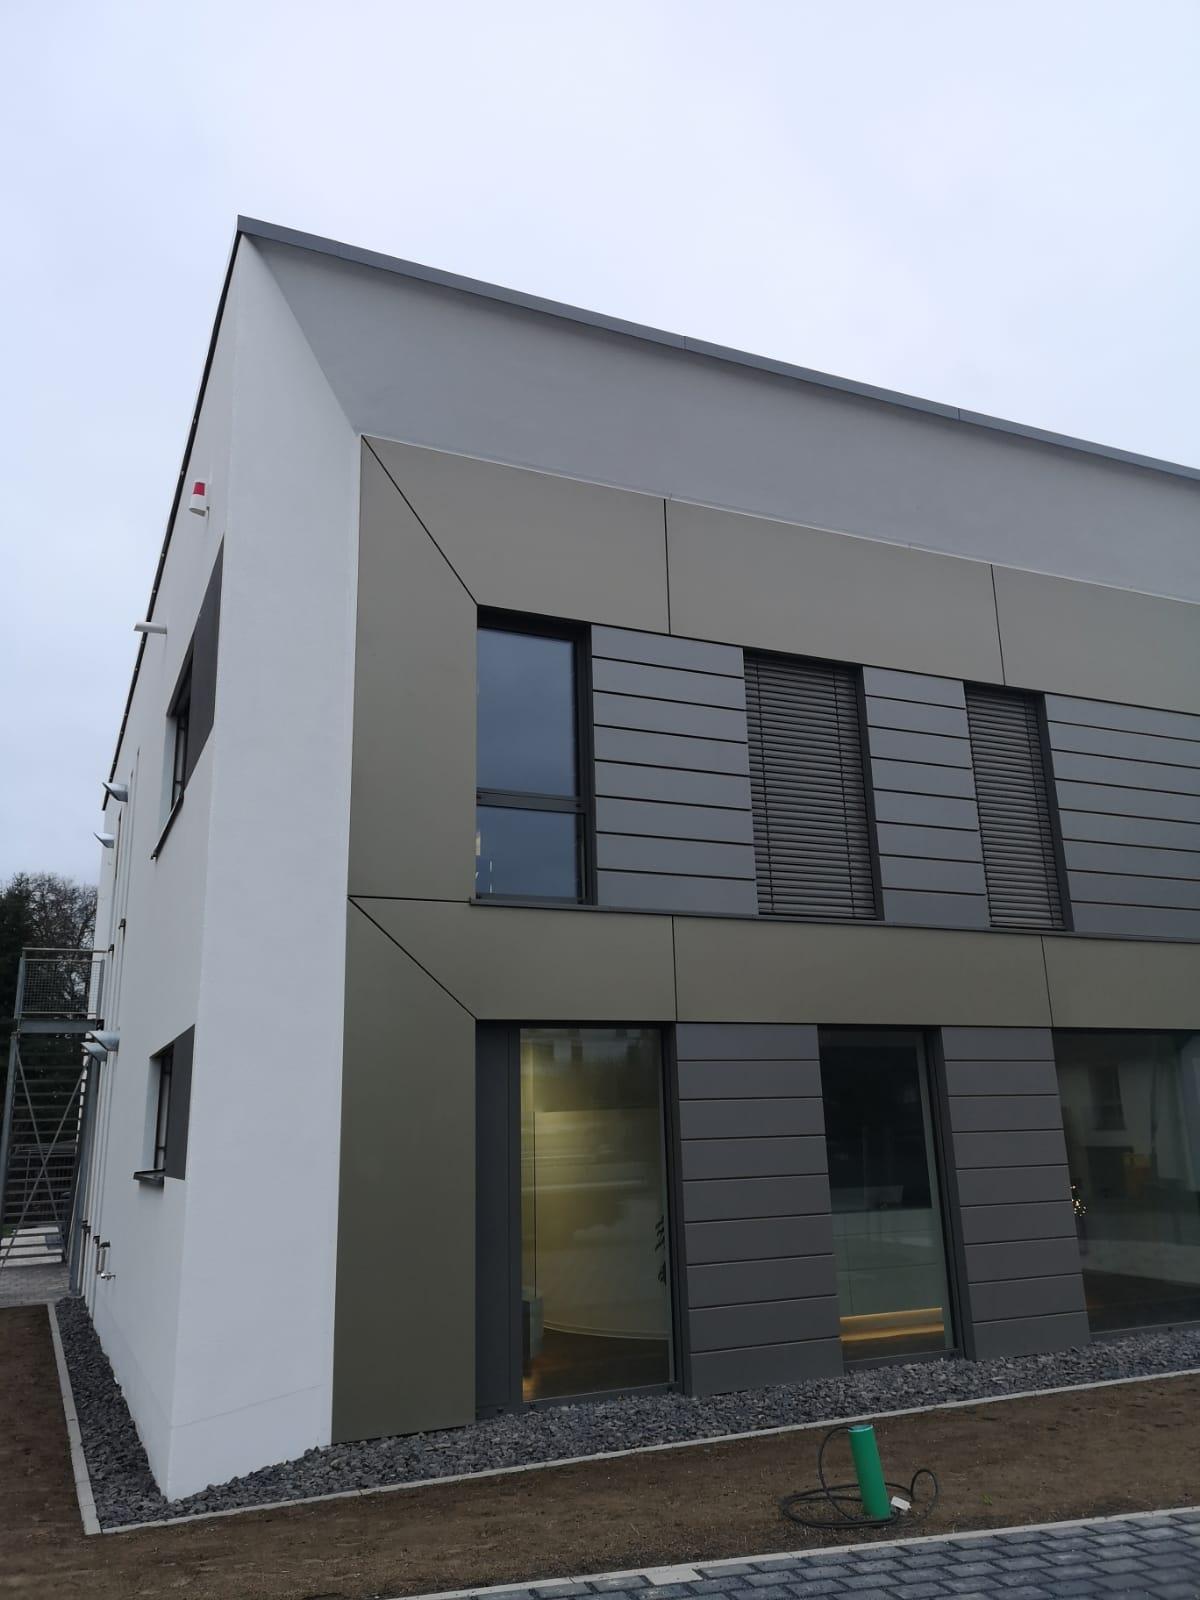 Ärztehaus Limburg